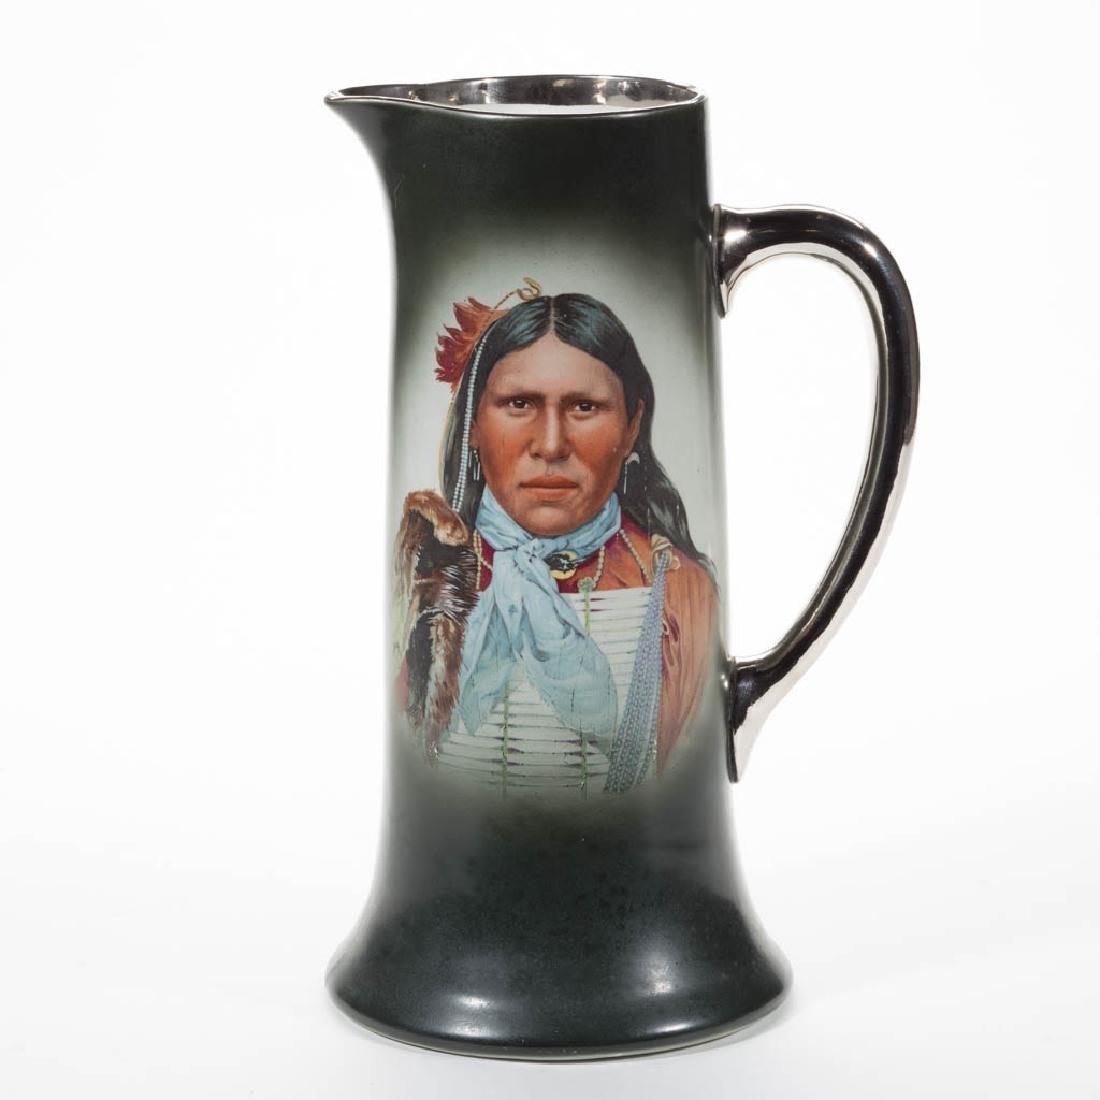 AMERICAN TRENTON, NEW JERSEY NATIVE AMERICAN INDIAN